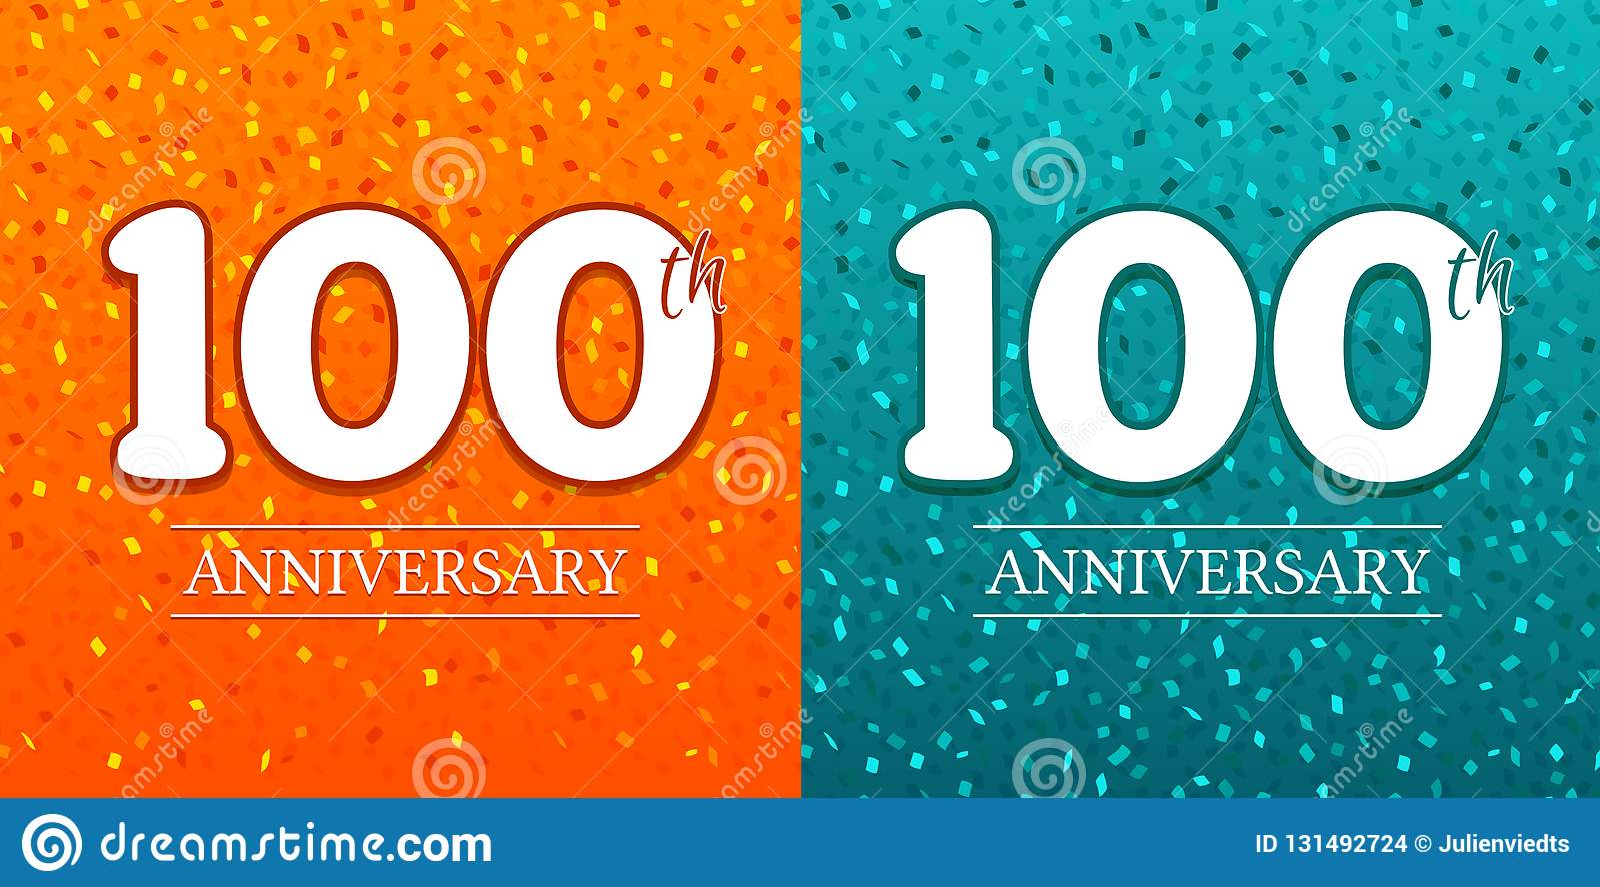 100th Anniversary Background - 100 years Celebration. Birthday Eps10 Vector